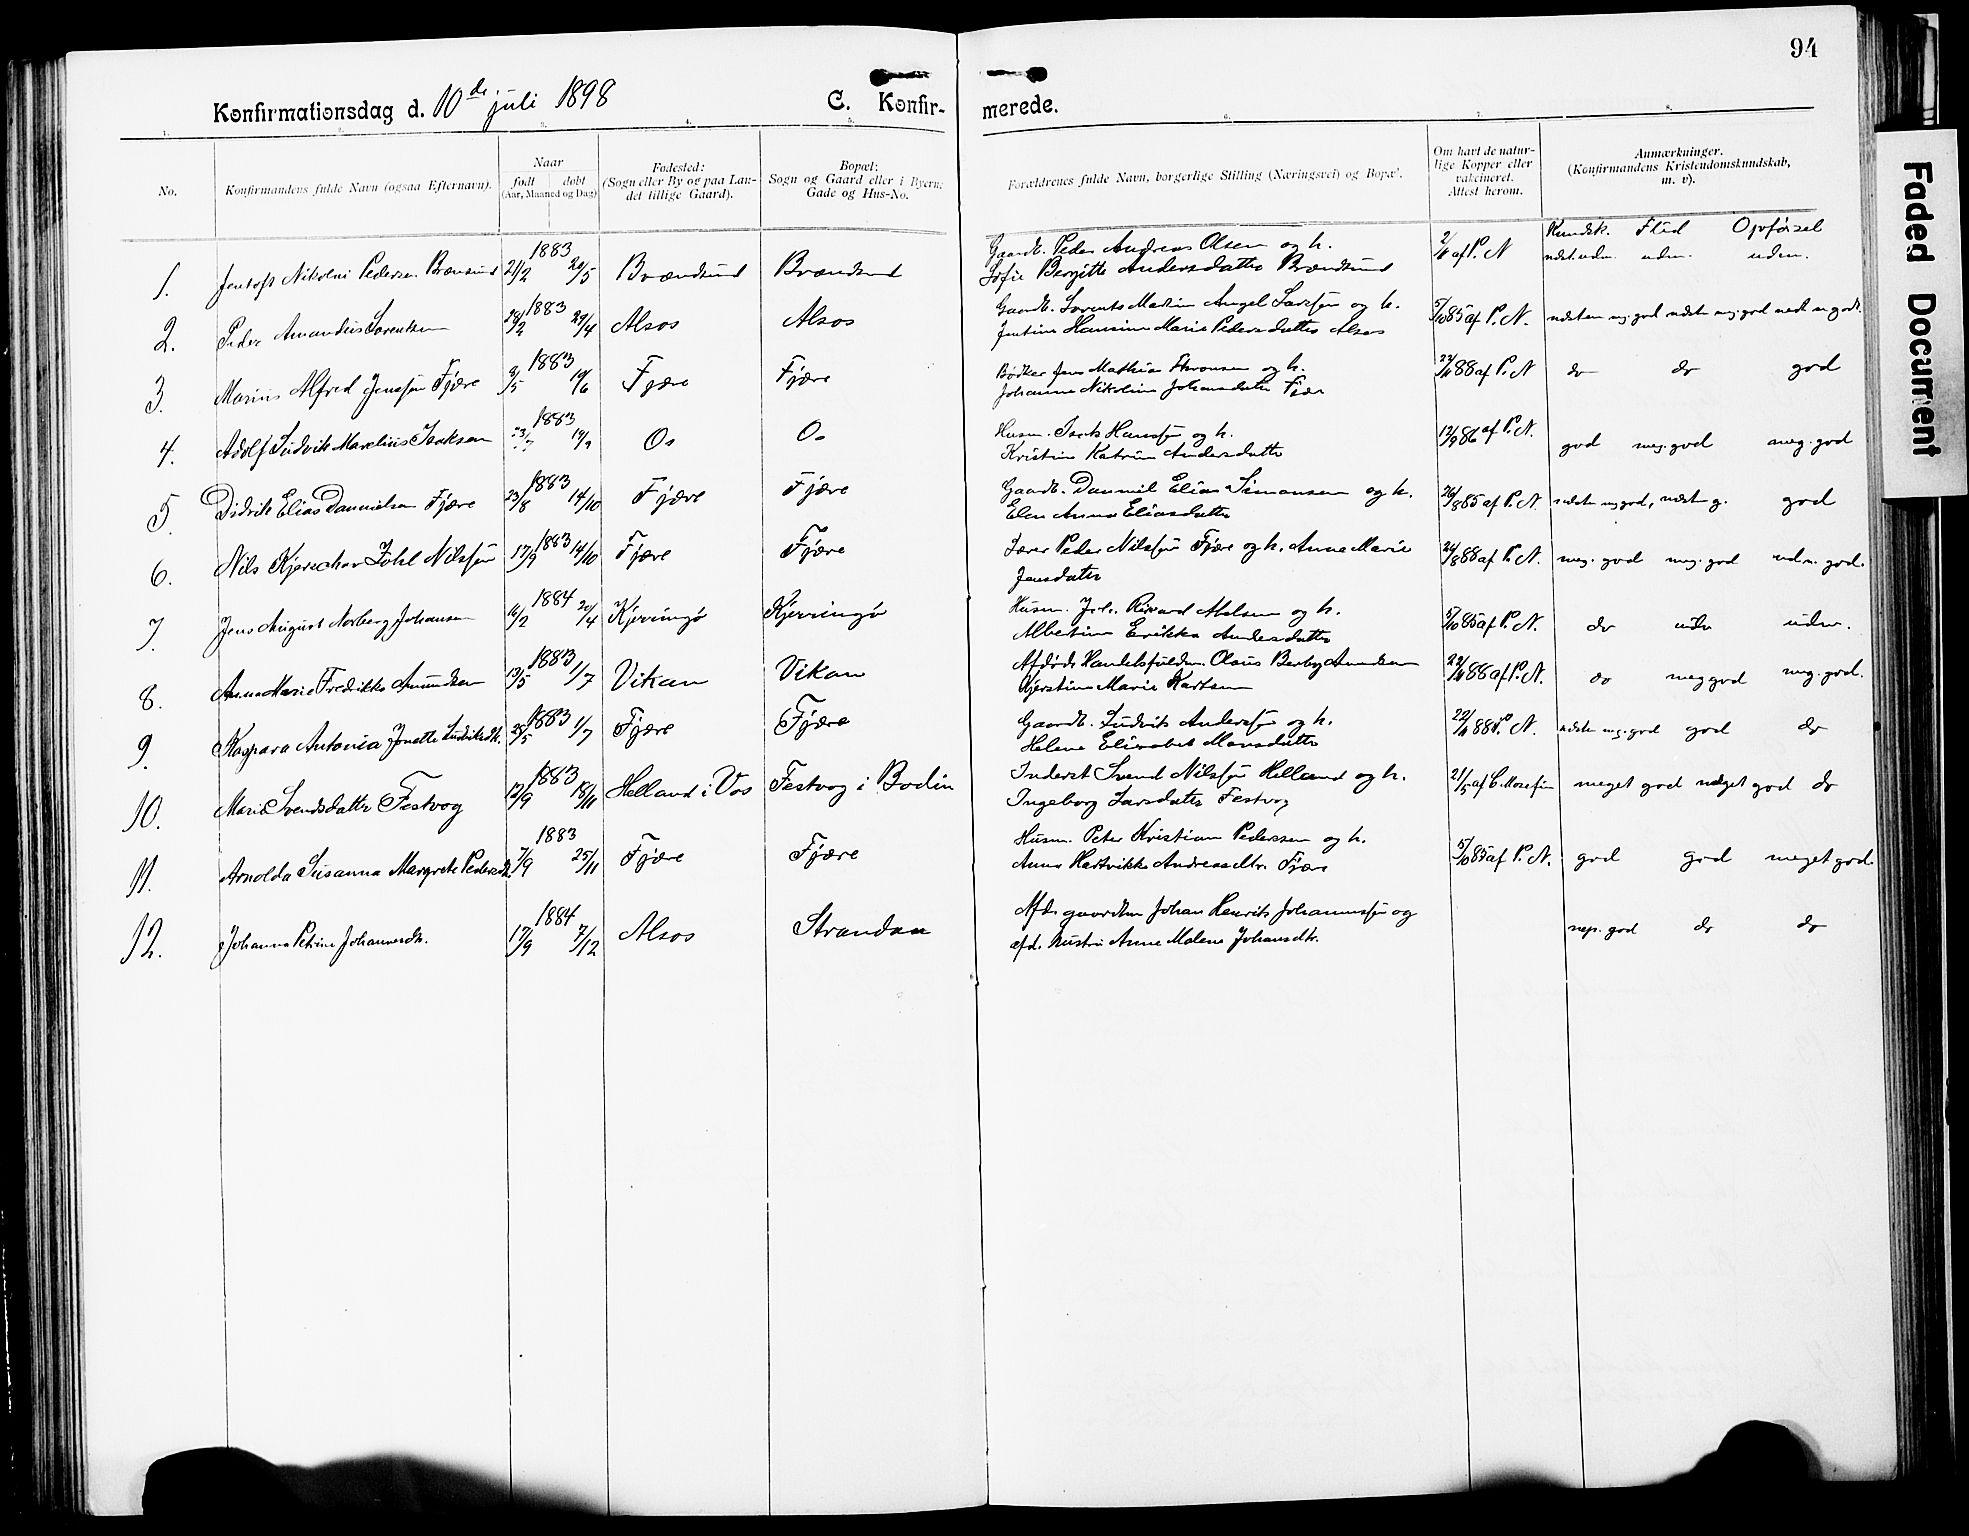 SAT, Ministerialprotokoller, klokkerbøker og fødselsregistre - Nordland, 803/L0077: Klokkerbok nr. 803C04, 1897-1930, s. 94